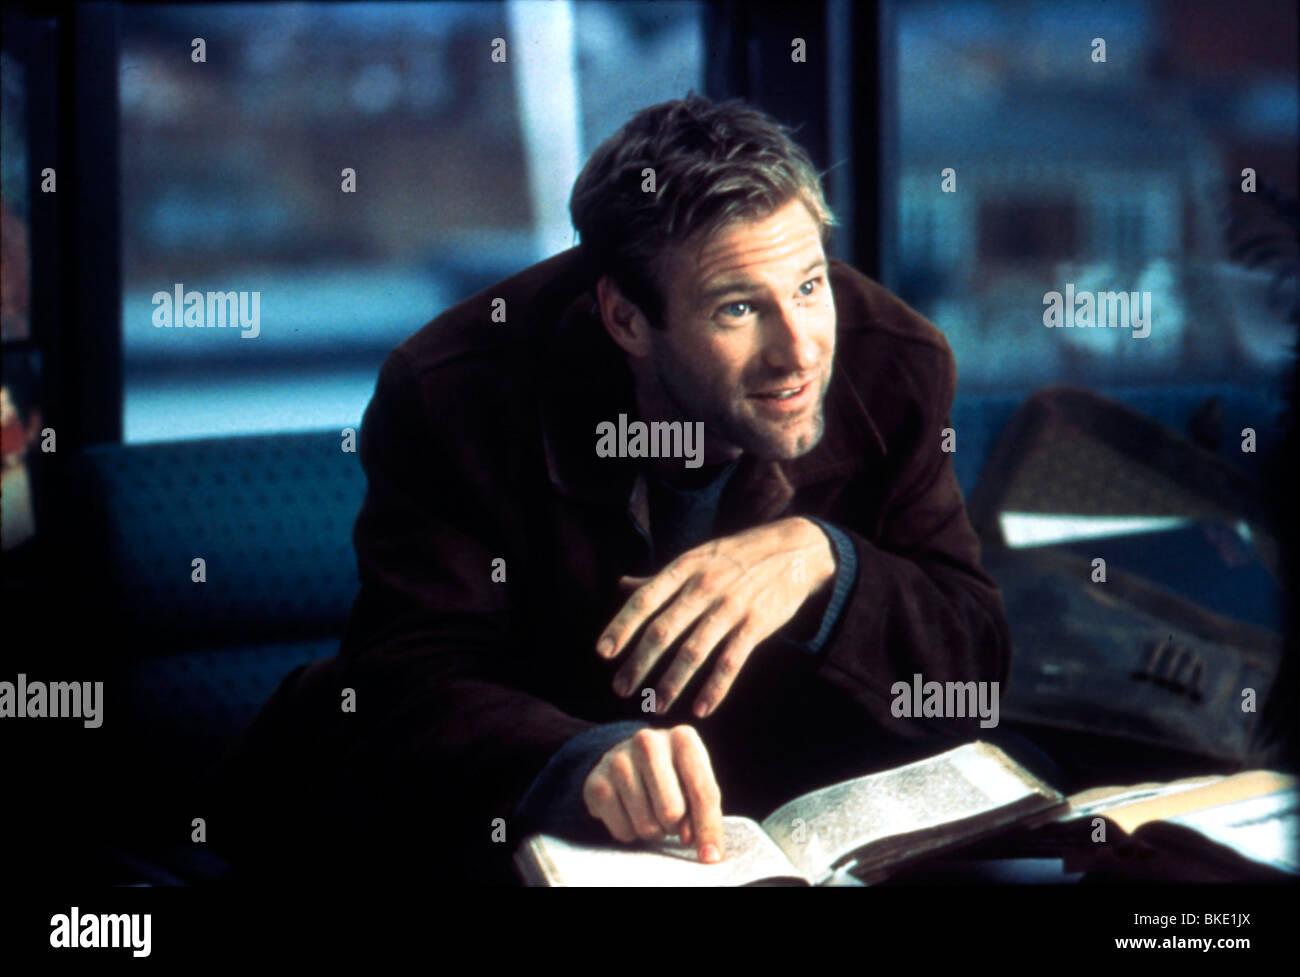 POSSESSION -2002 AARON ECKHART - Stock Image